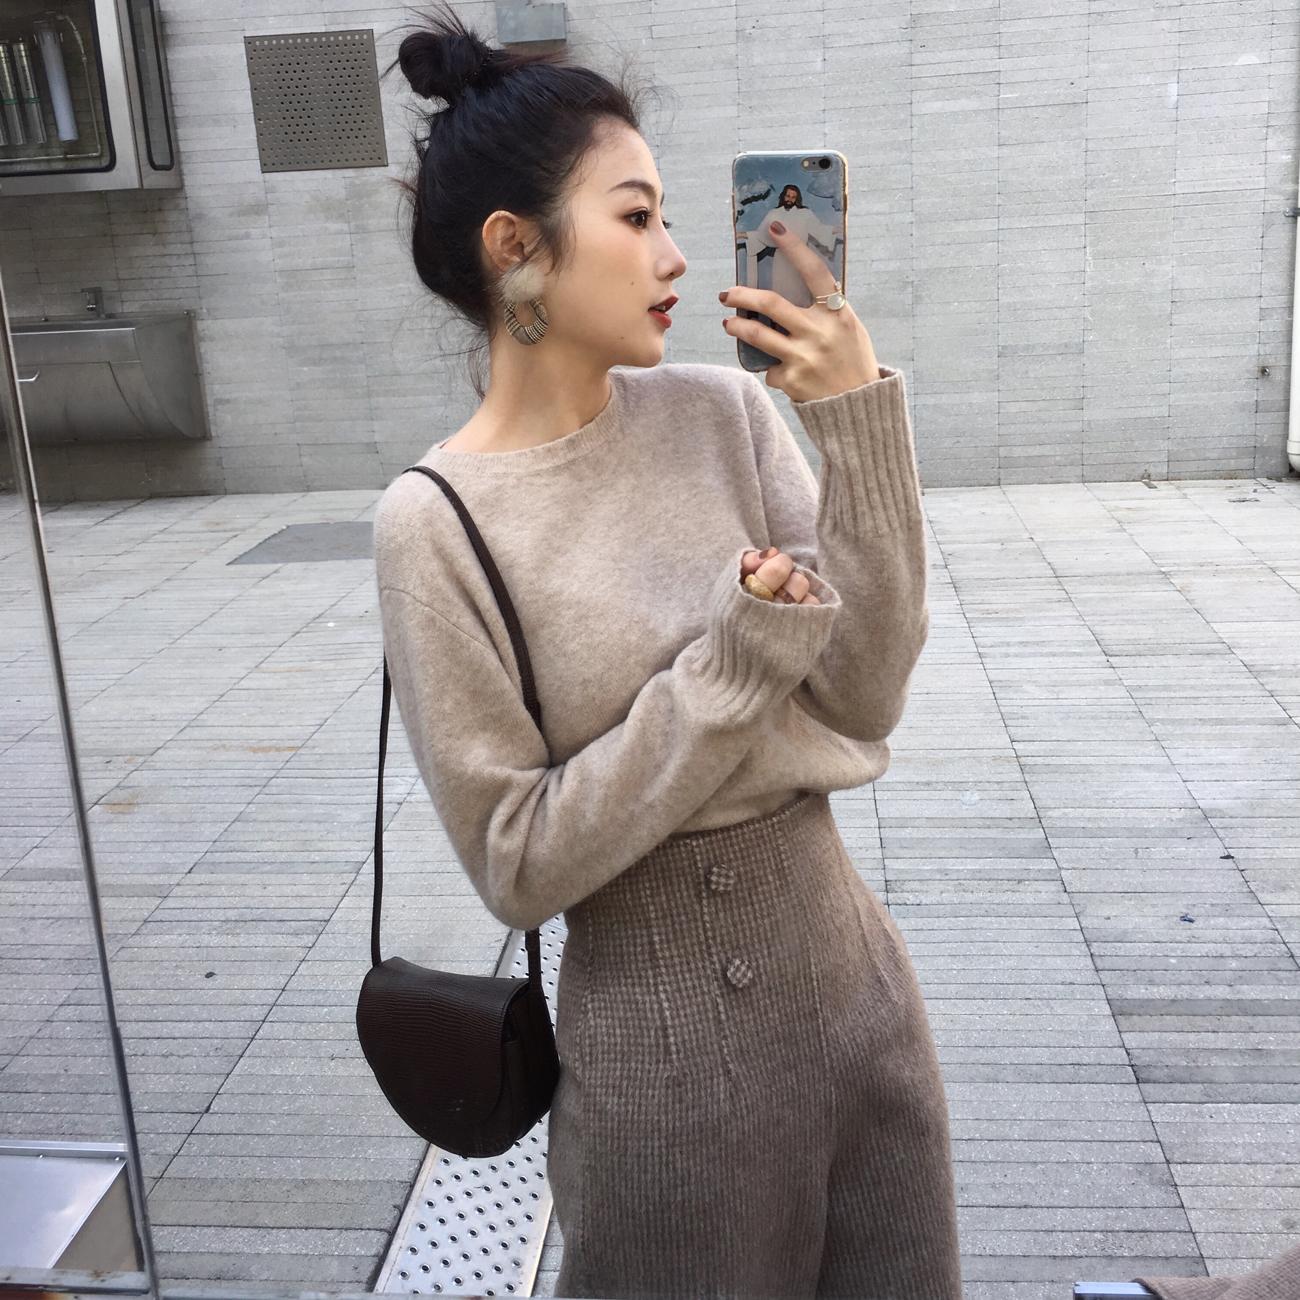 ◆ASM◆2018冬季新款百搭圆领打底衫套头纯色修身毛衣针织衫女装